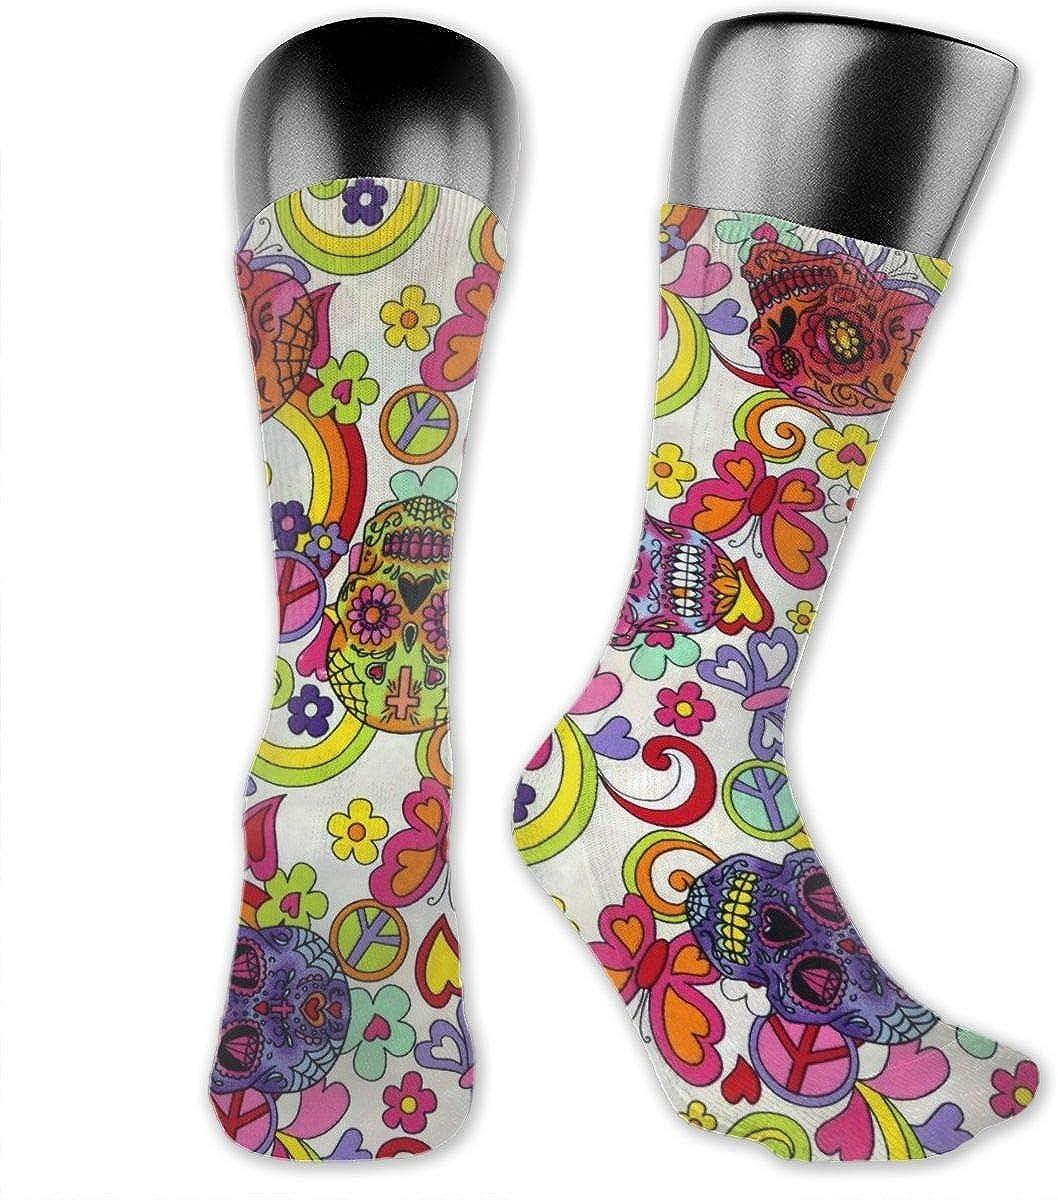 Boys Girls Crew Dress Socks Athletic Odor Seasonal Import Wrap Introduction Running Resistant So